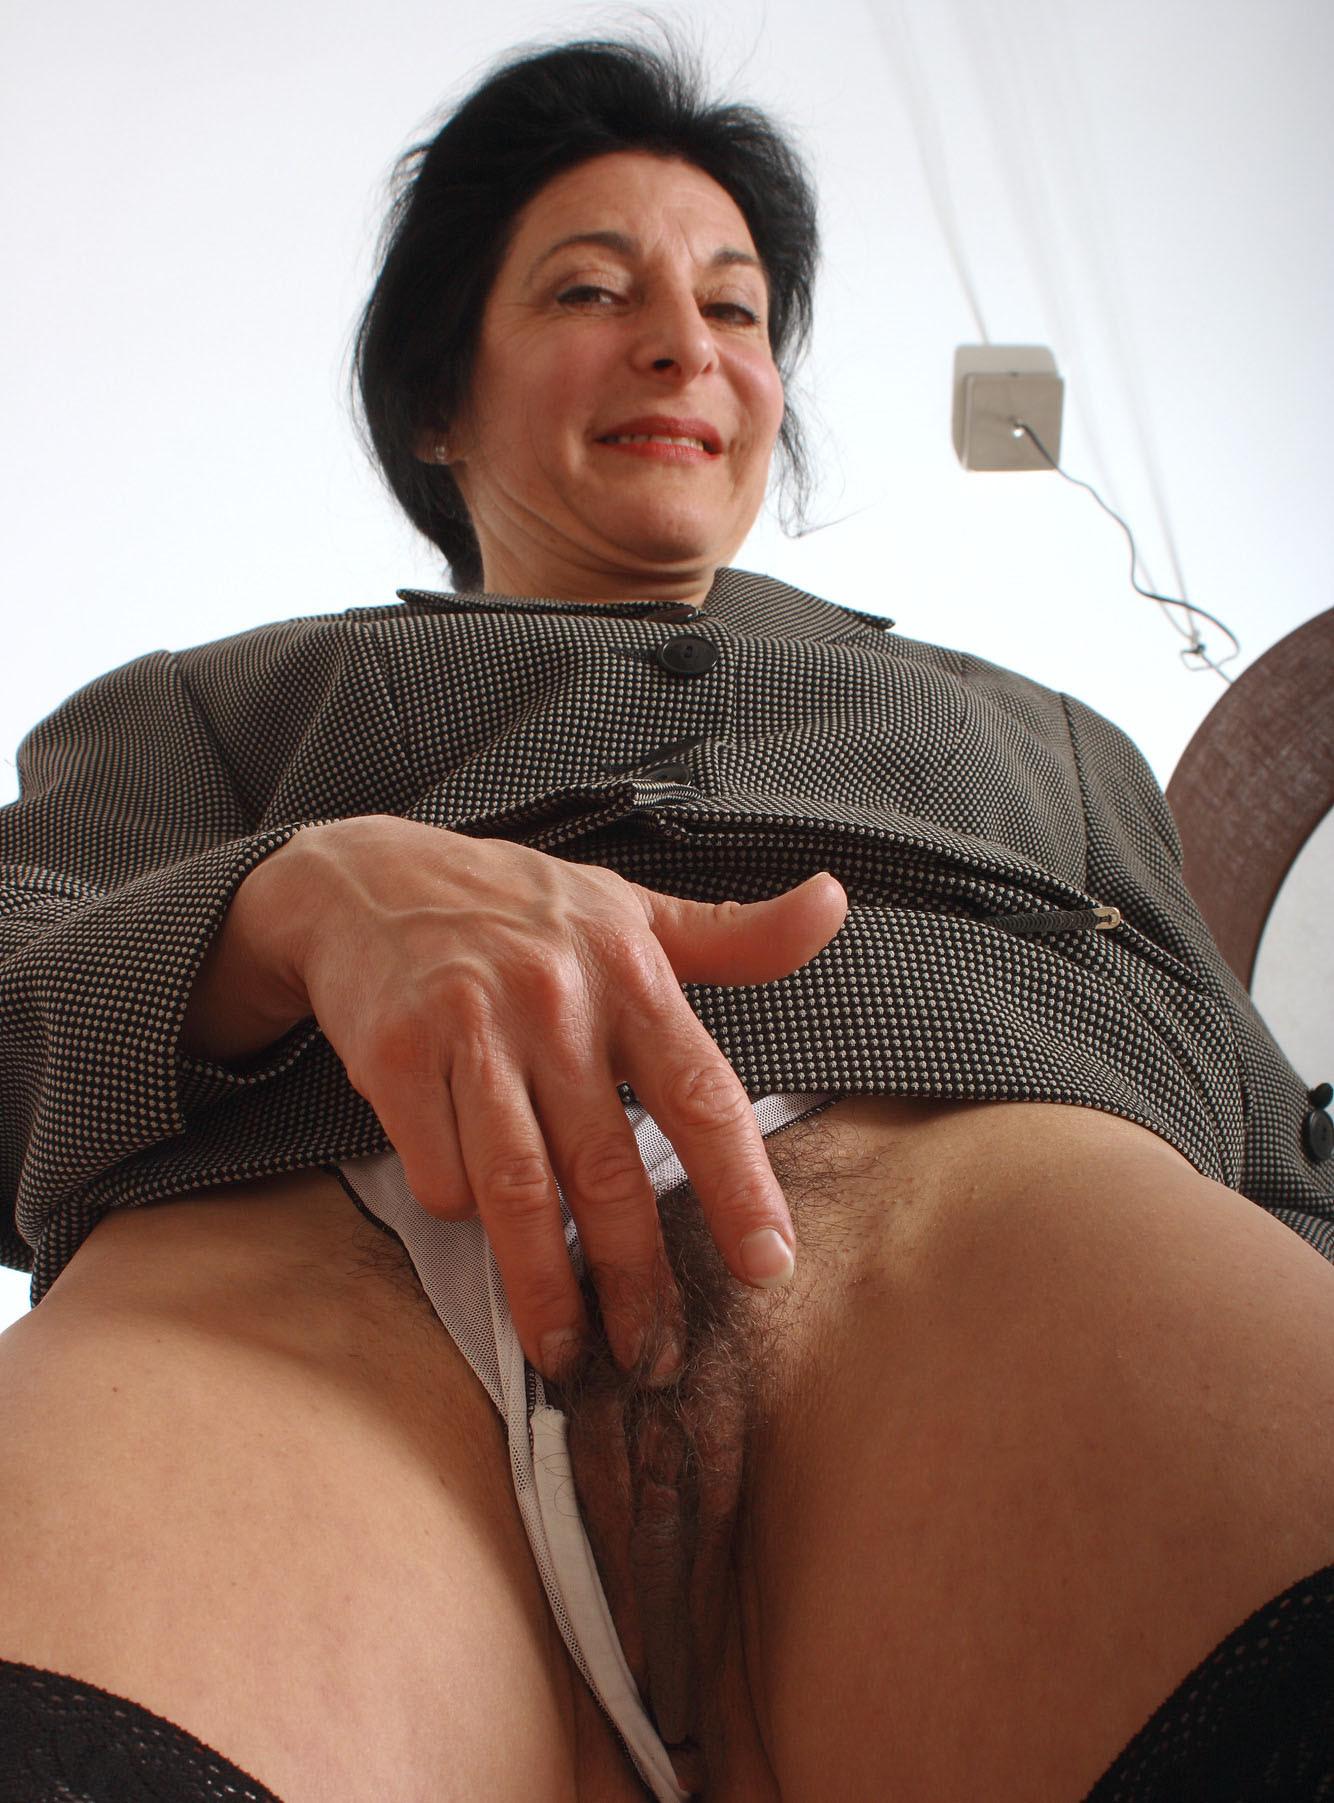 Porn online old secretary